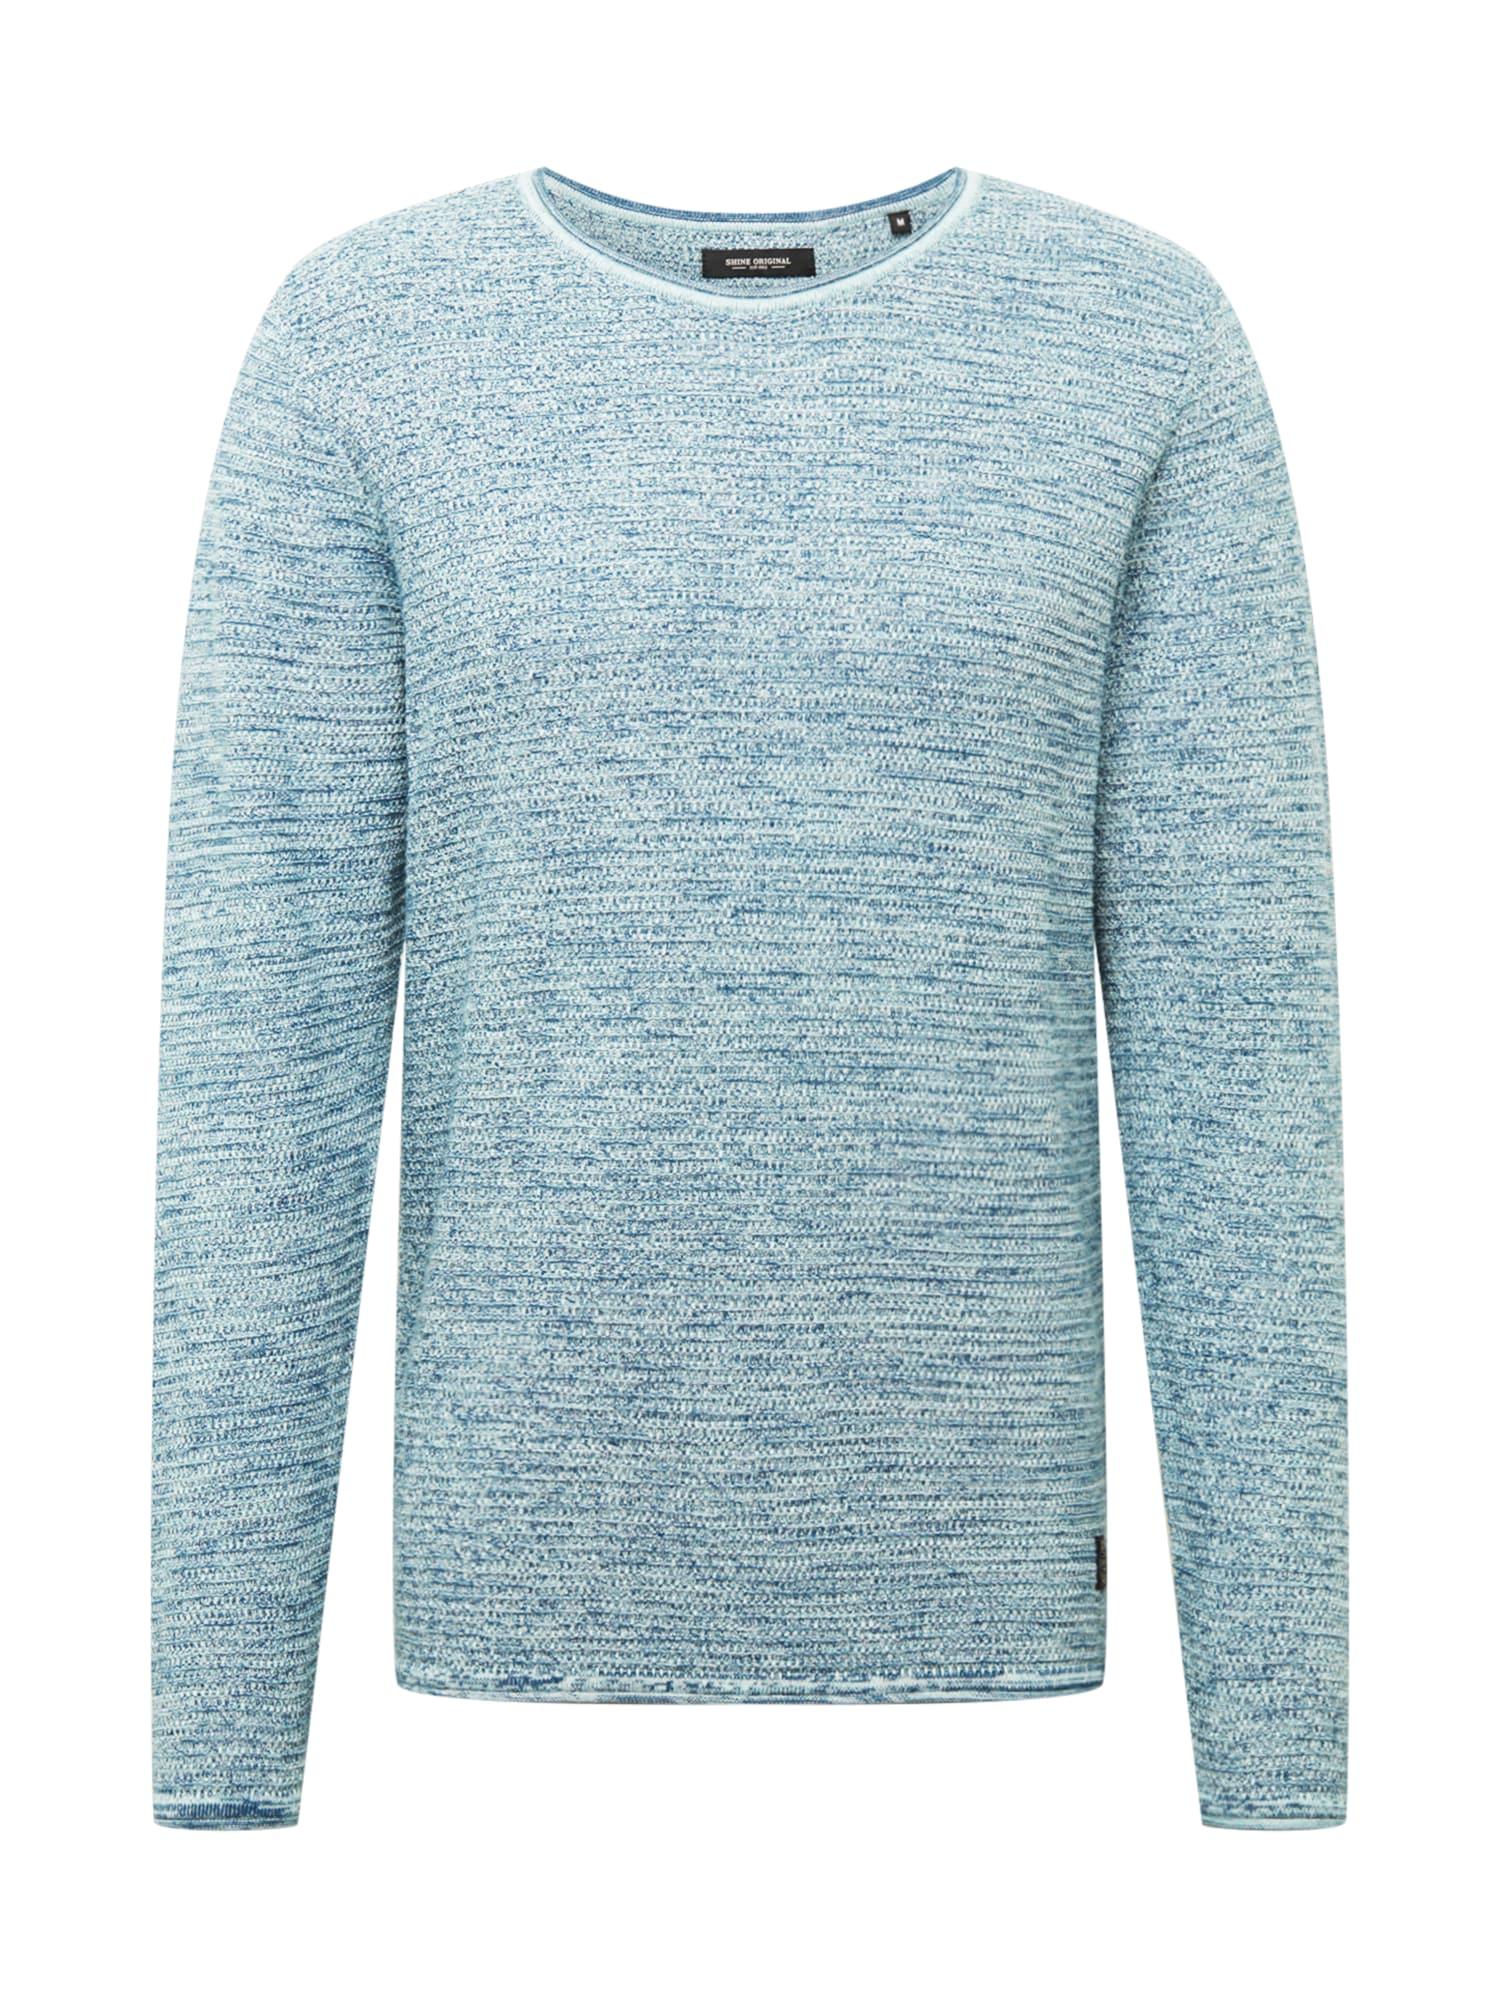 SHINE ORIGINAL Megztinis margai mėlyna